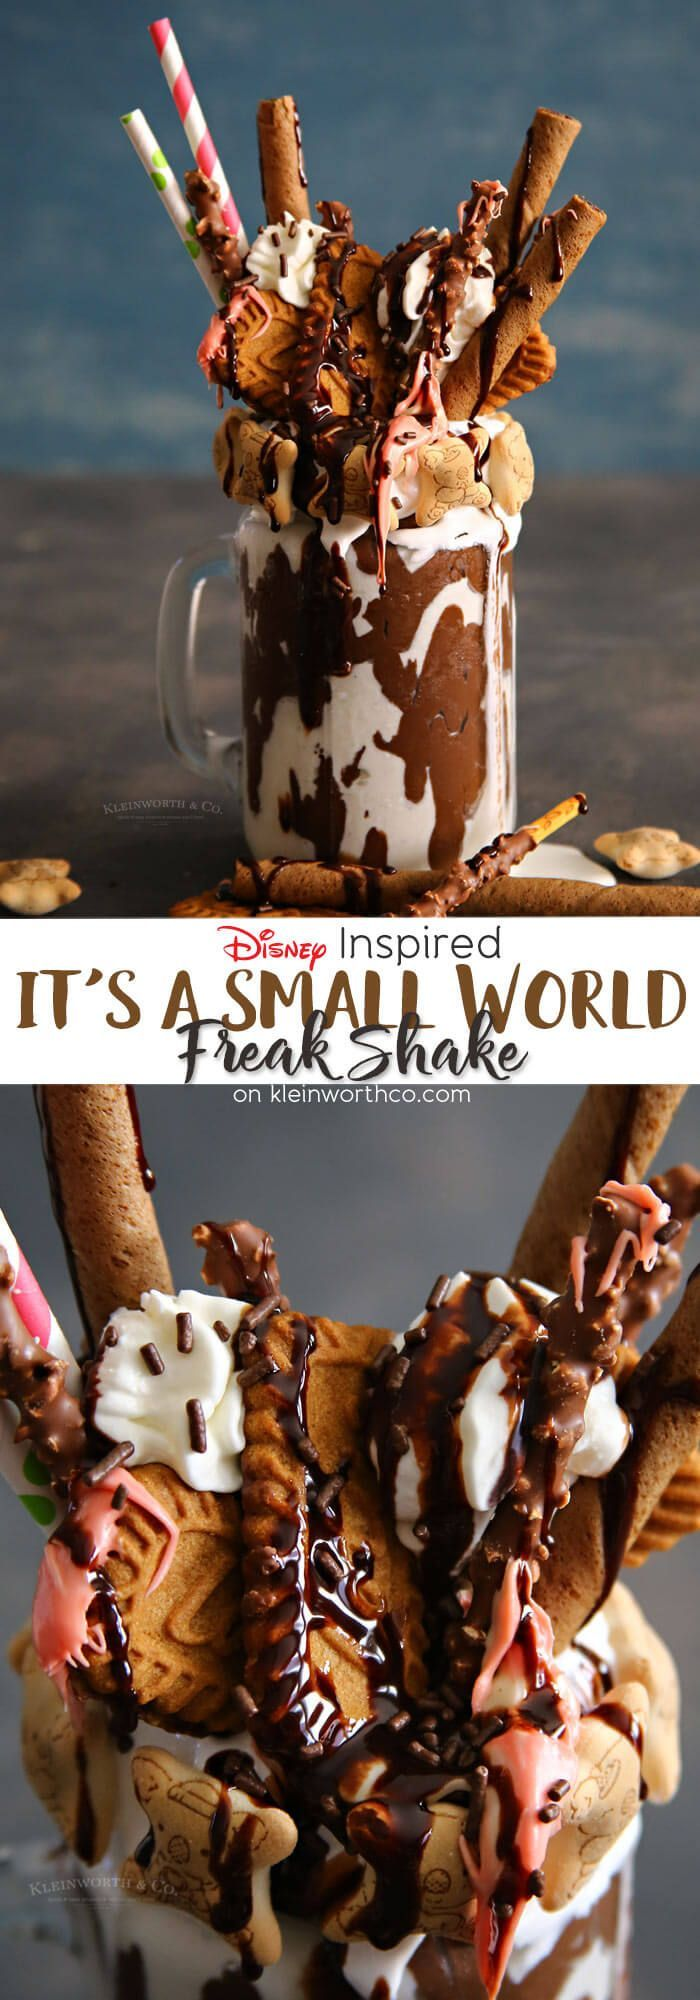 It's a Small World Freak Shake